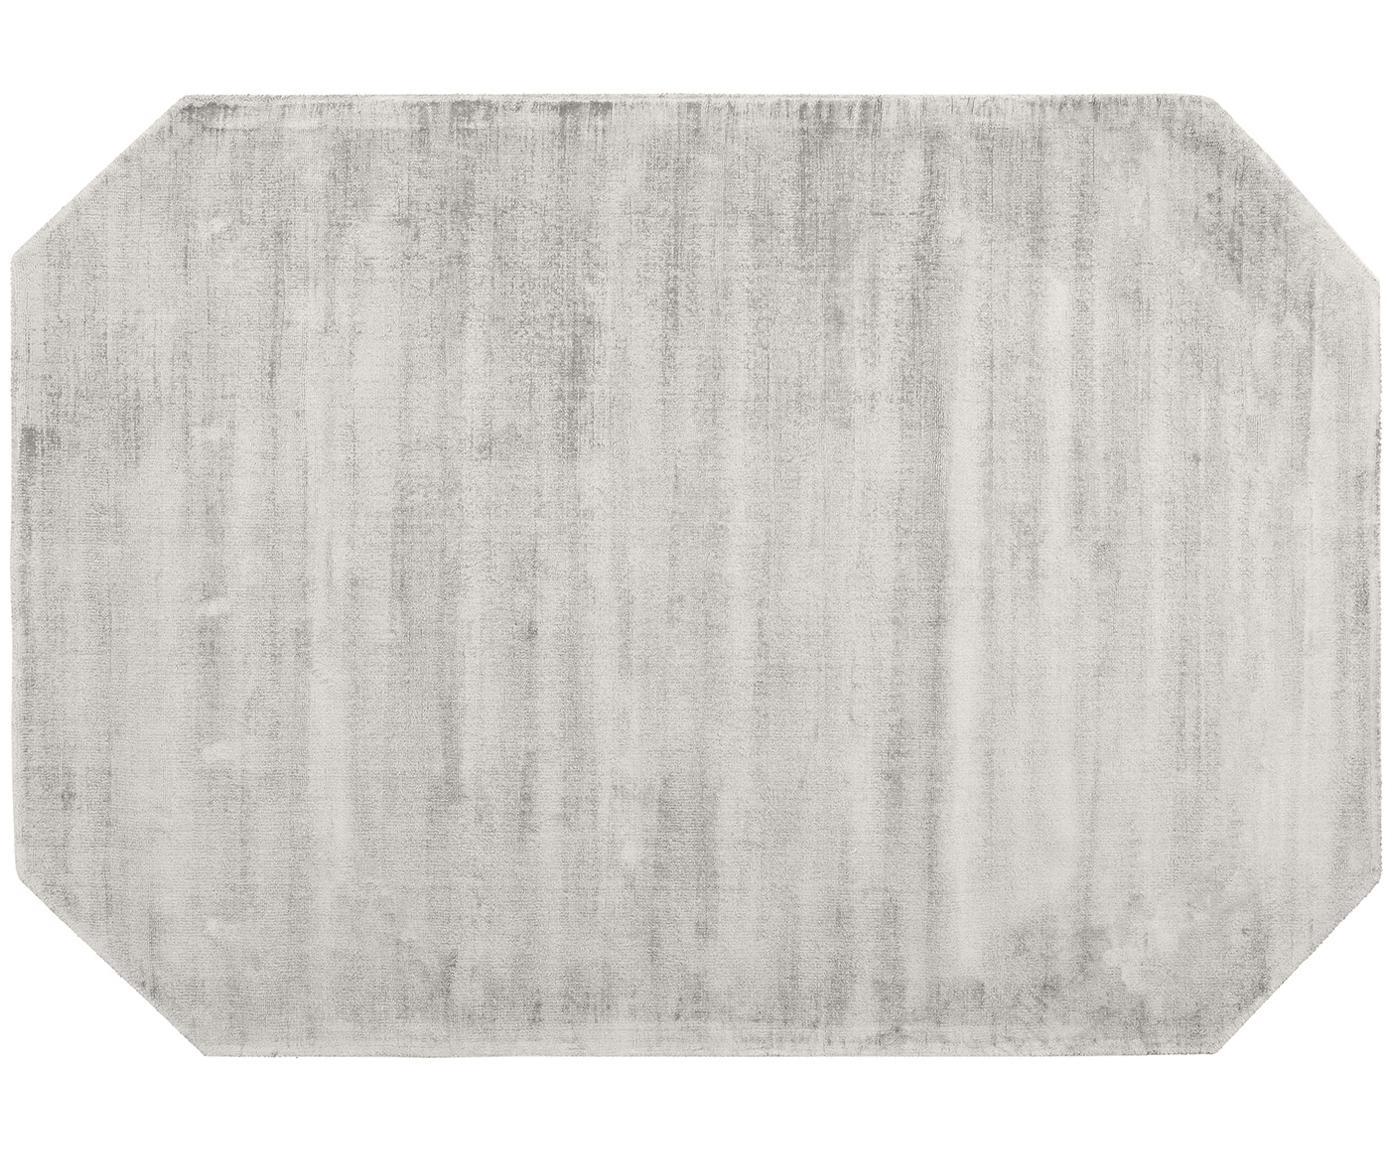 Alfombra artesanal de viscosa Jane Diamond, Parte superior: 100%viscosa, Reverso: 100%algodón, Gris claro, An 120 x L 180 cm (Tamaño S)